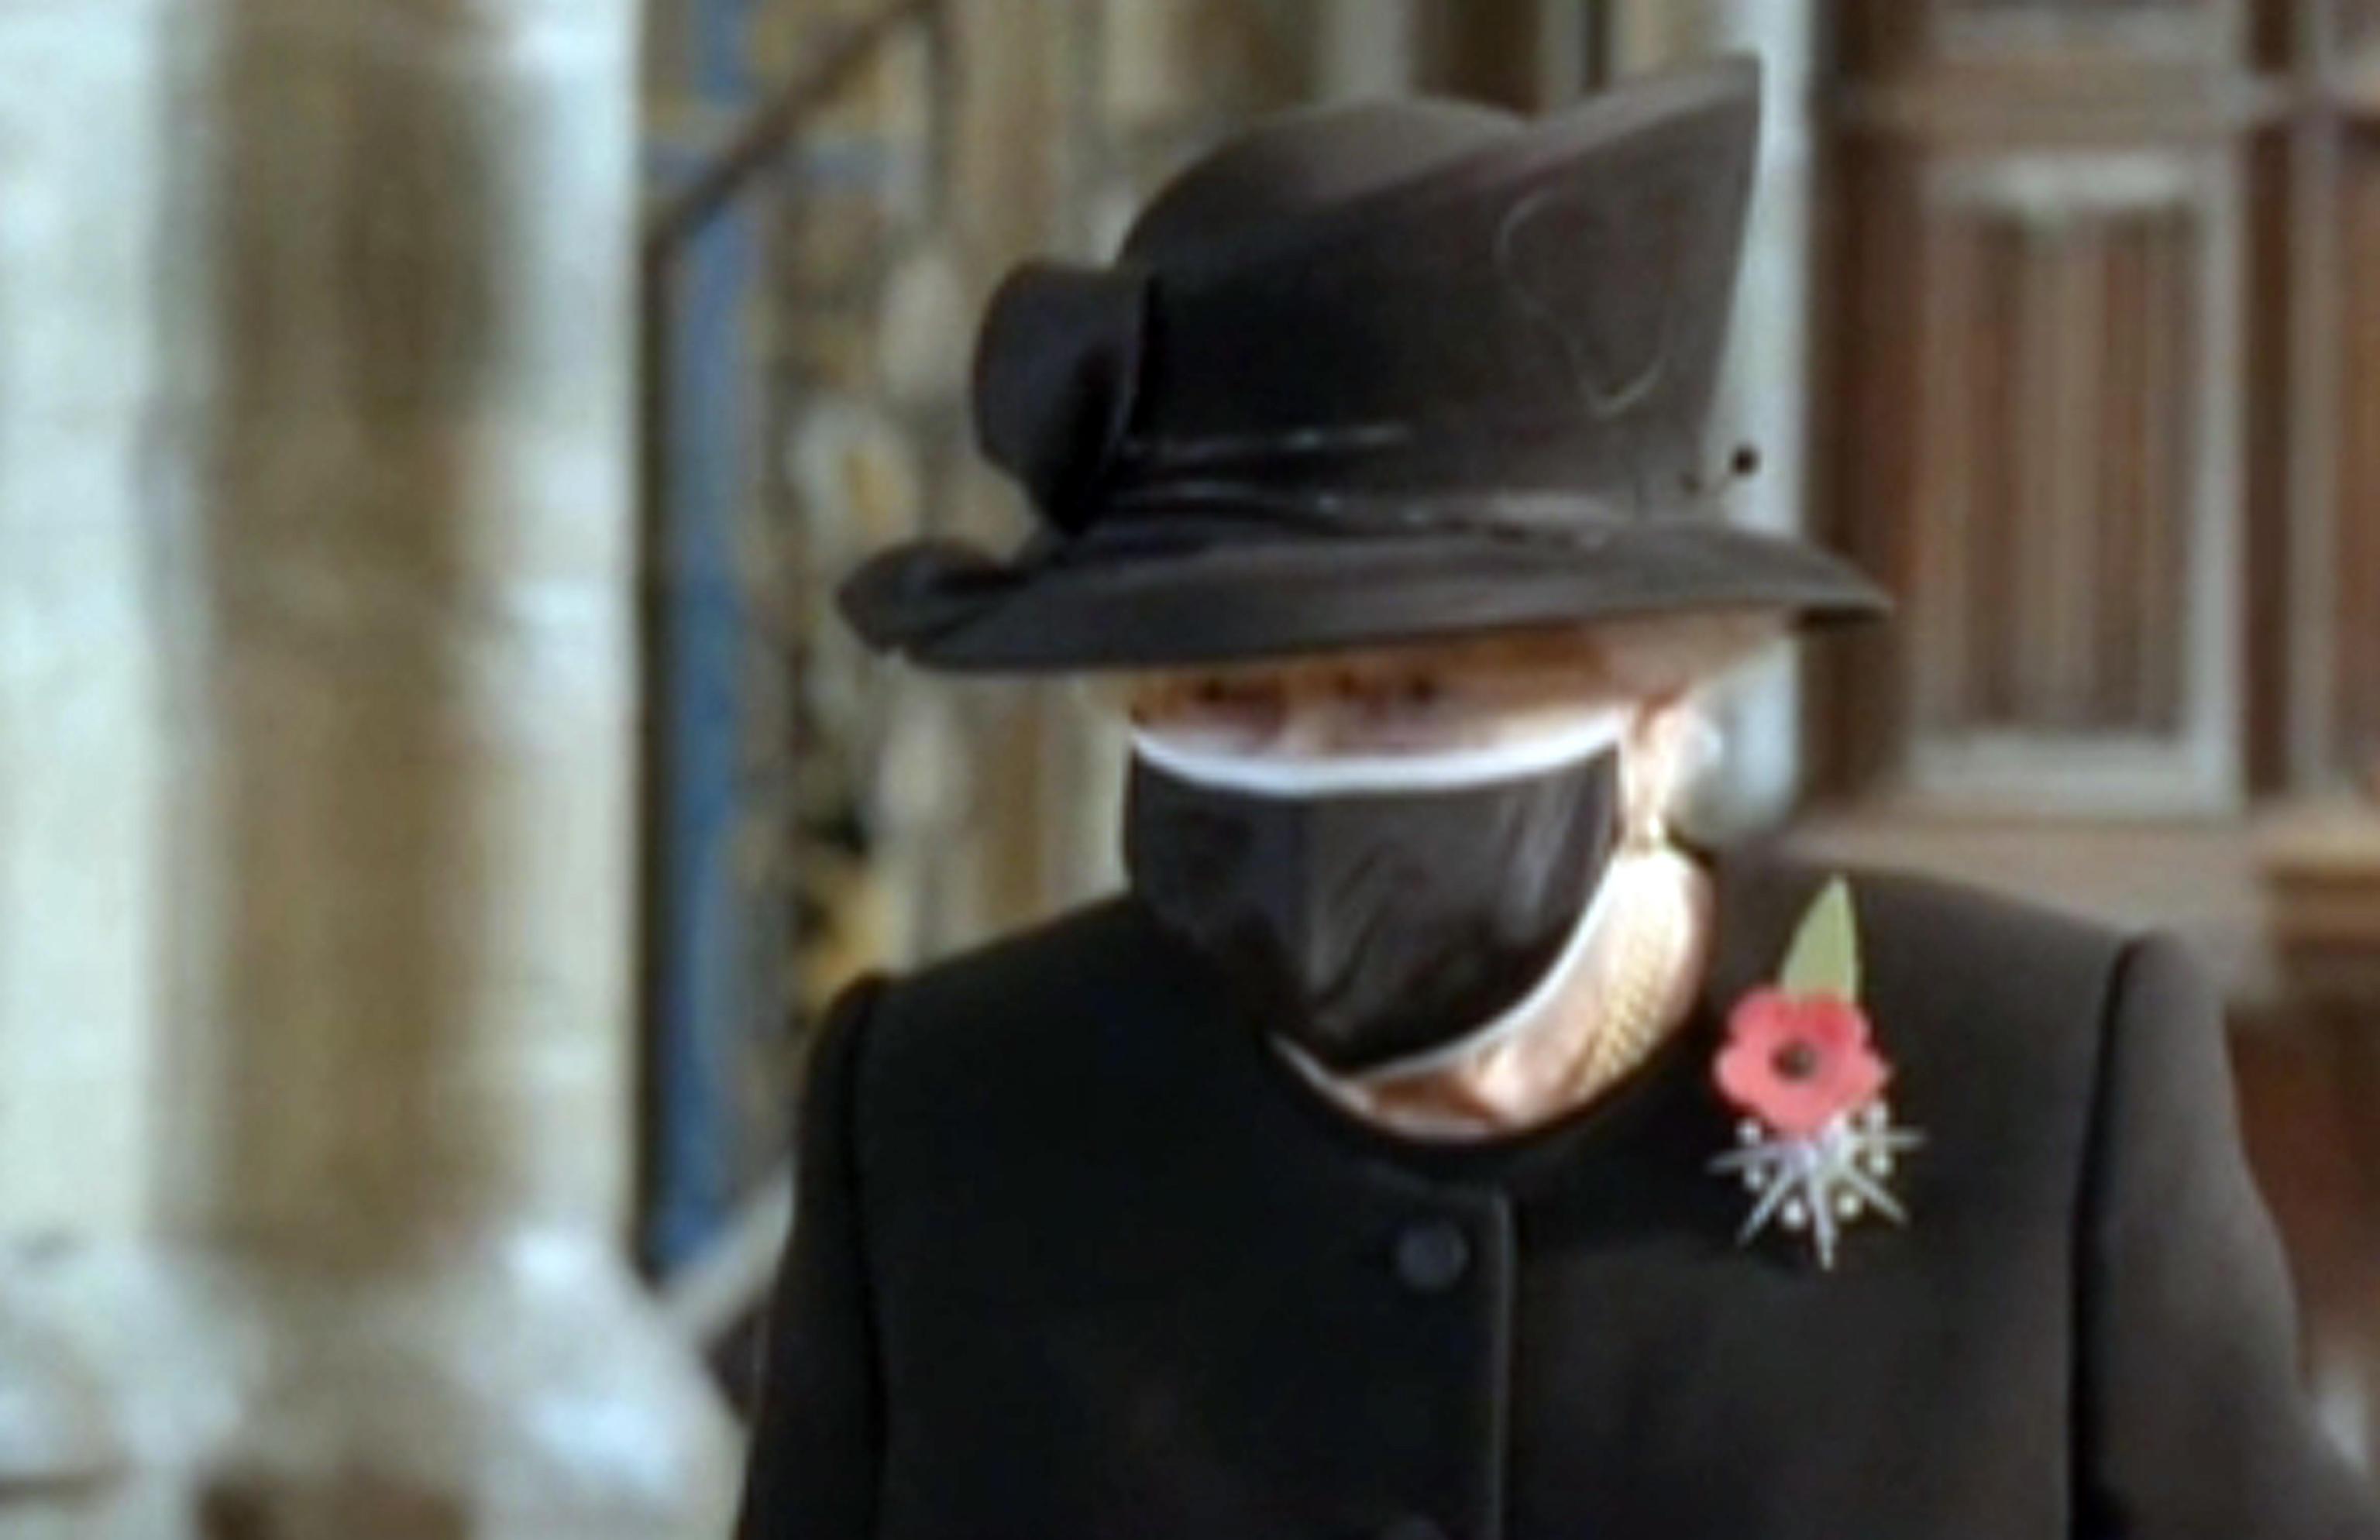 La regina Elisabetta ha trascorso la notte in ospedale: lo rende noto Buckingham Palace